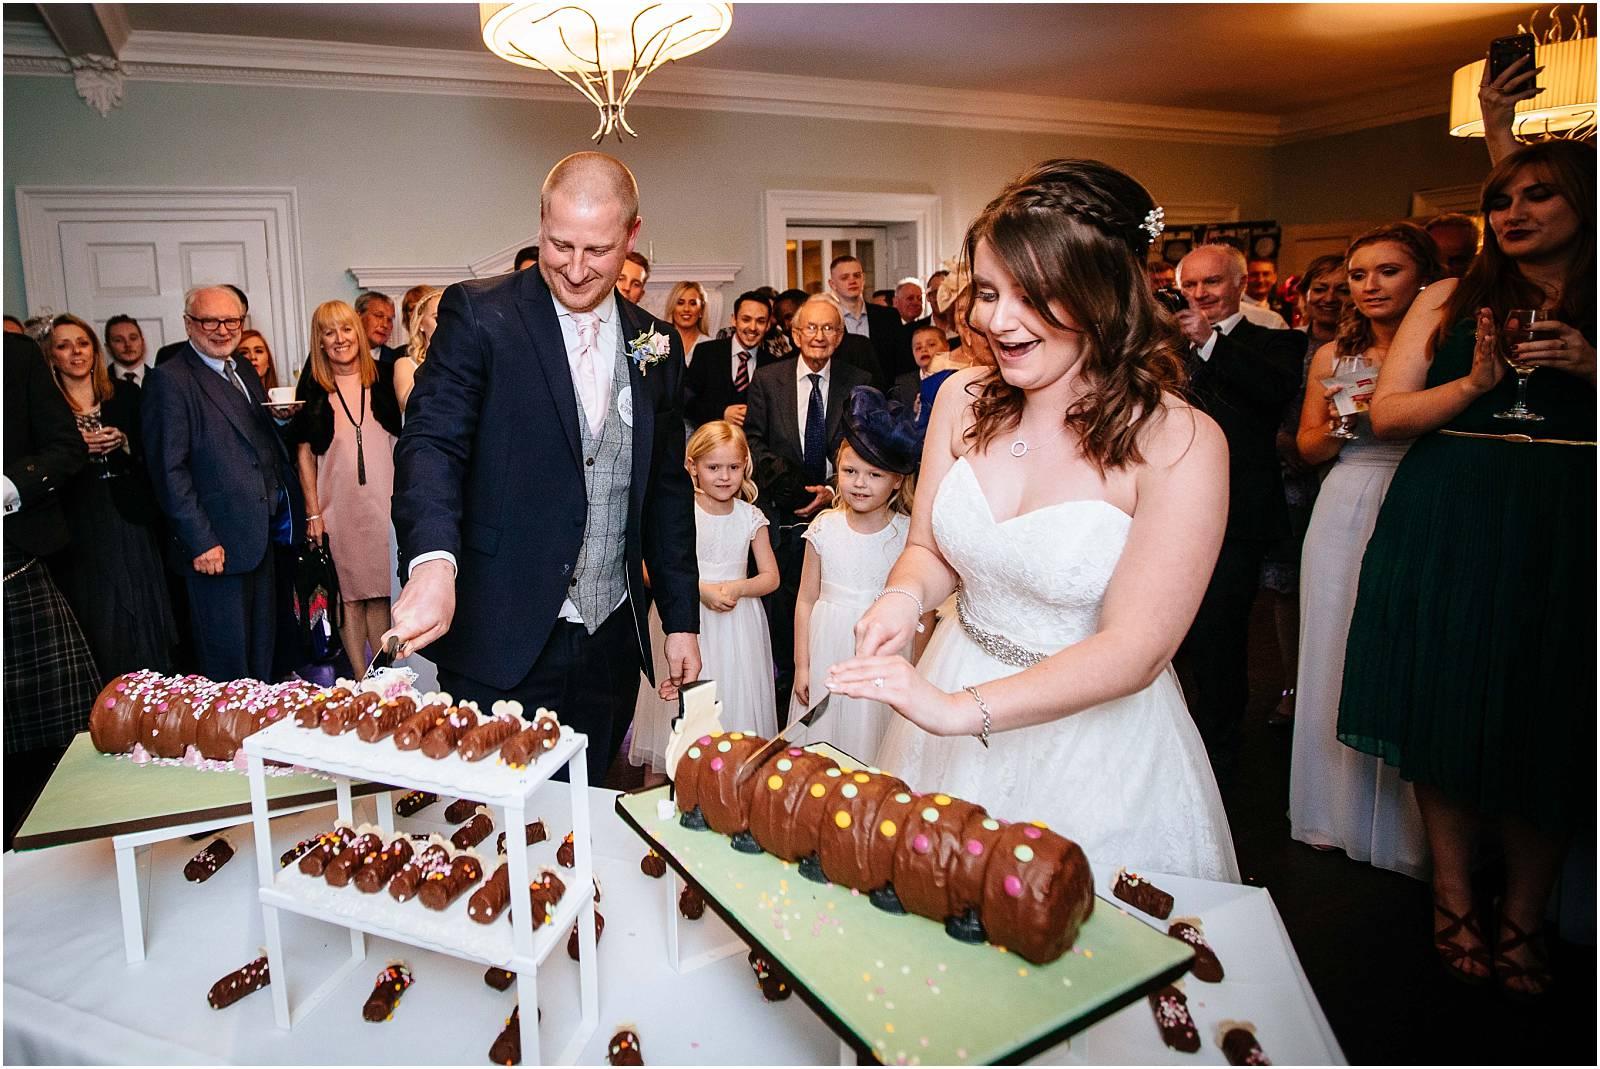 marks and spencer wedding cake caterpillar